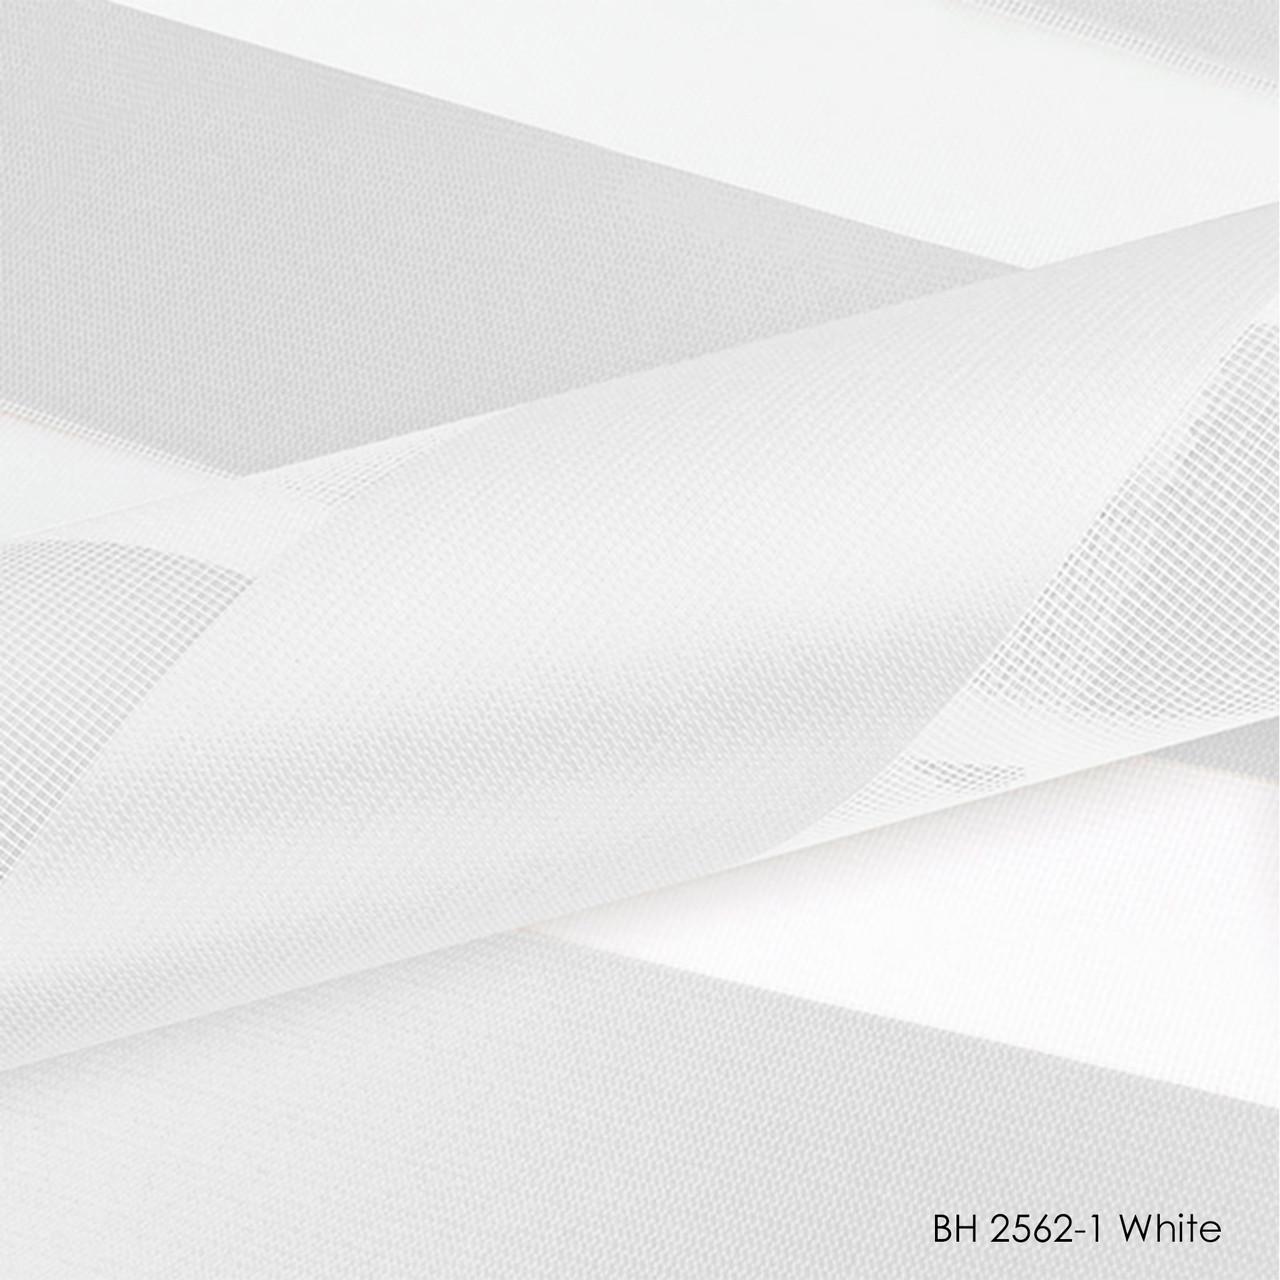 Ролеты день ночь BH 2562-1 White